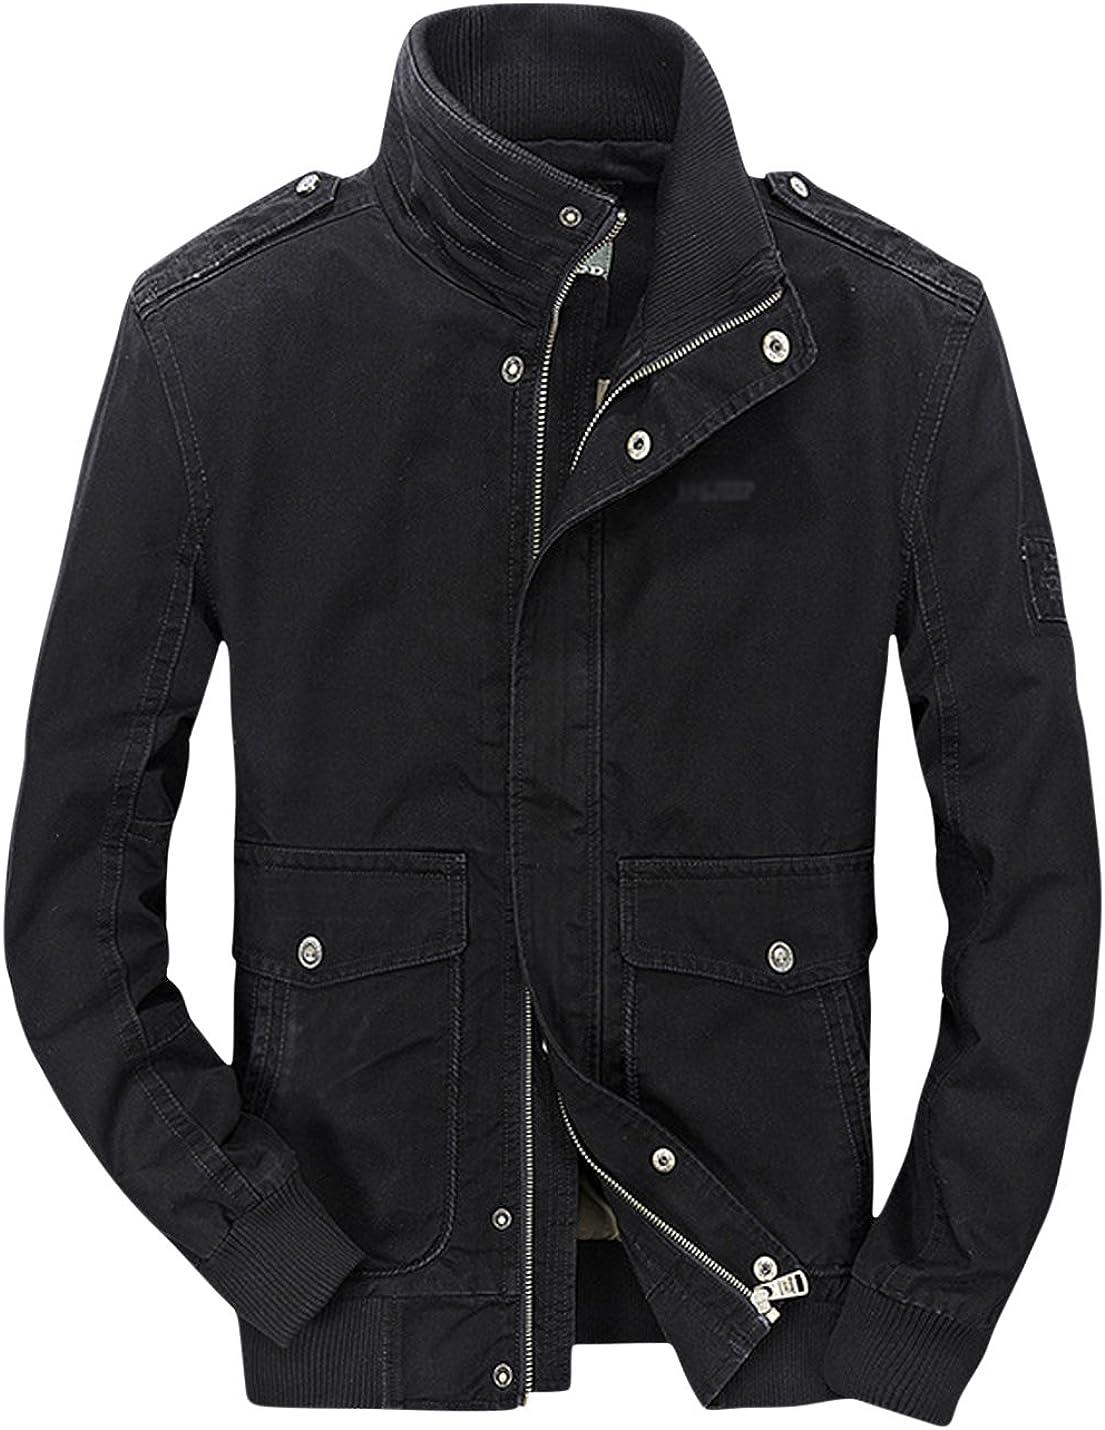 Max 77% OFF Springrain Men's Rib Stand Zipper Outerwear Pockets Max 41% OFF Cotton Solid